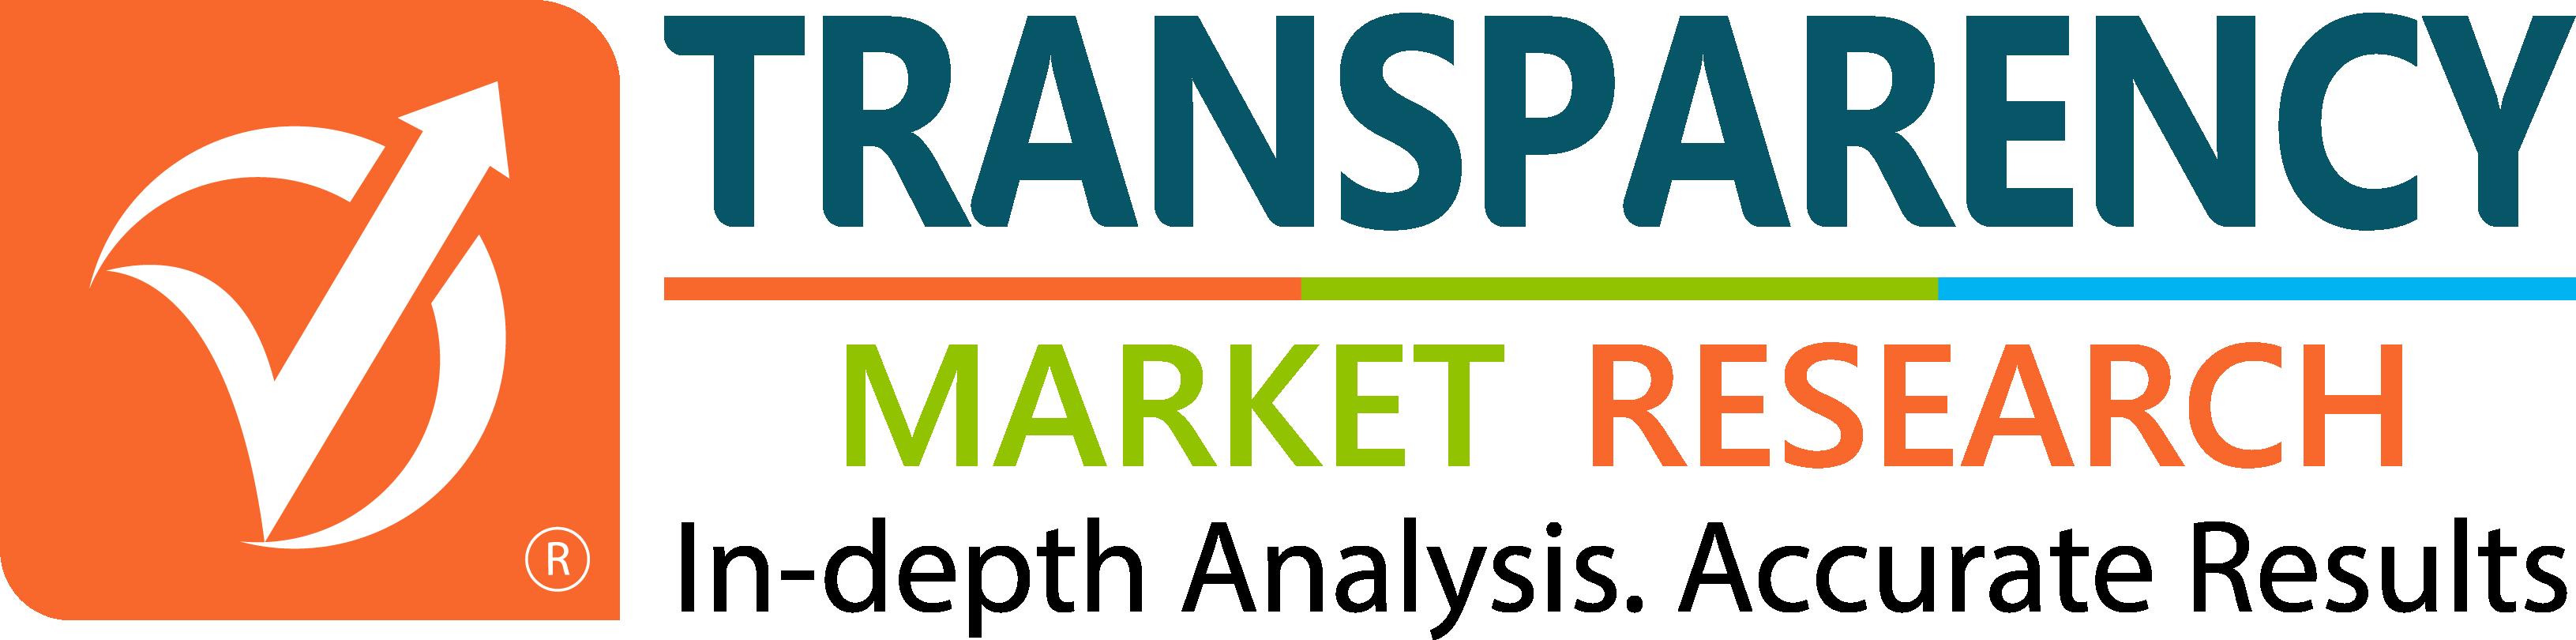 Ultrasonic Scalpels Market Scenario Highlighting Major Drivers & Trends, 2017-2025